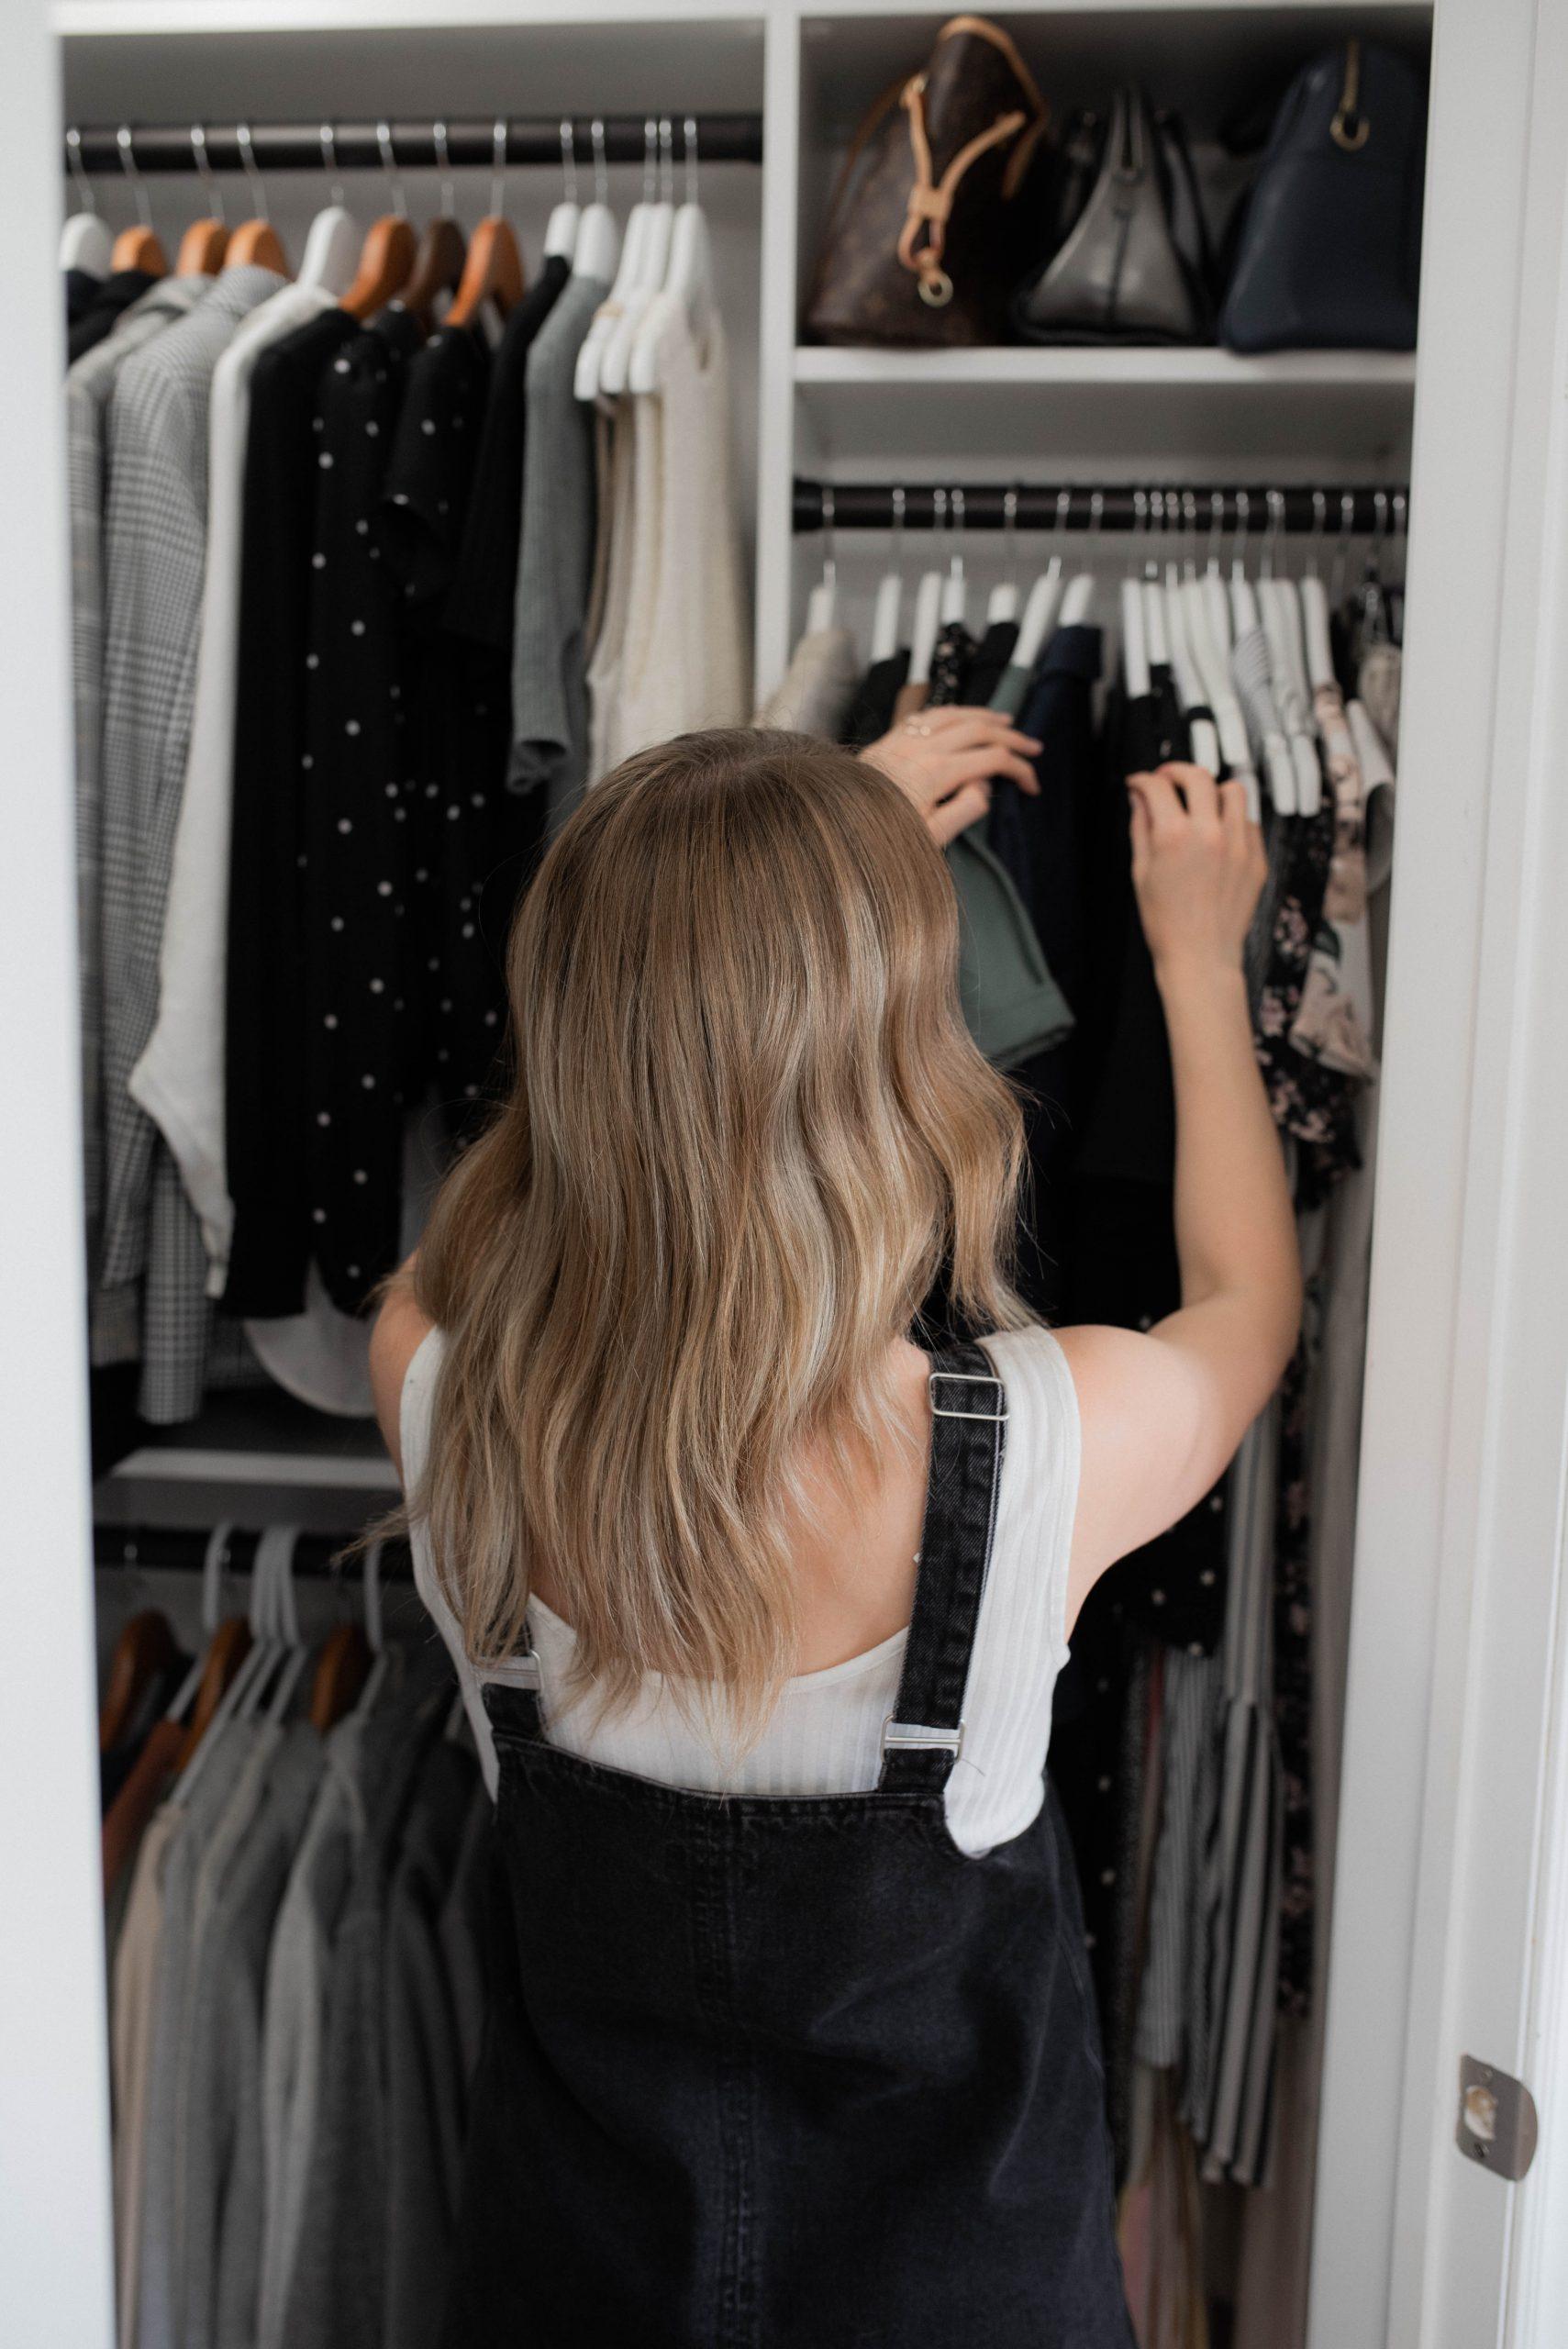 woman looking through minimized wardrobe